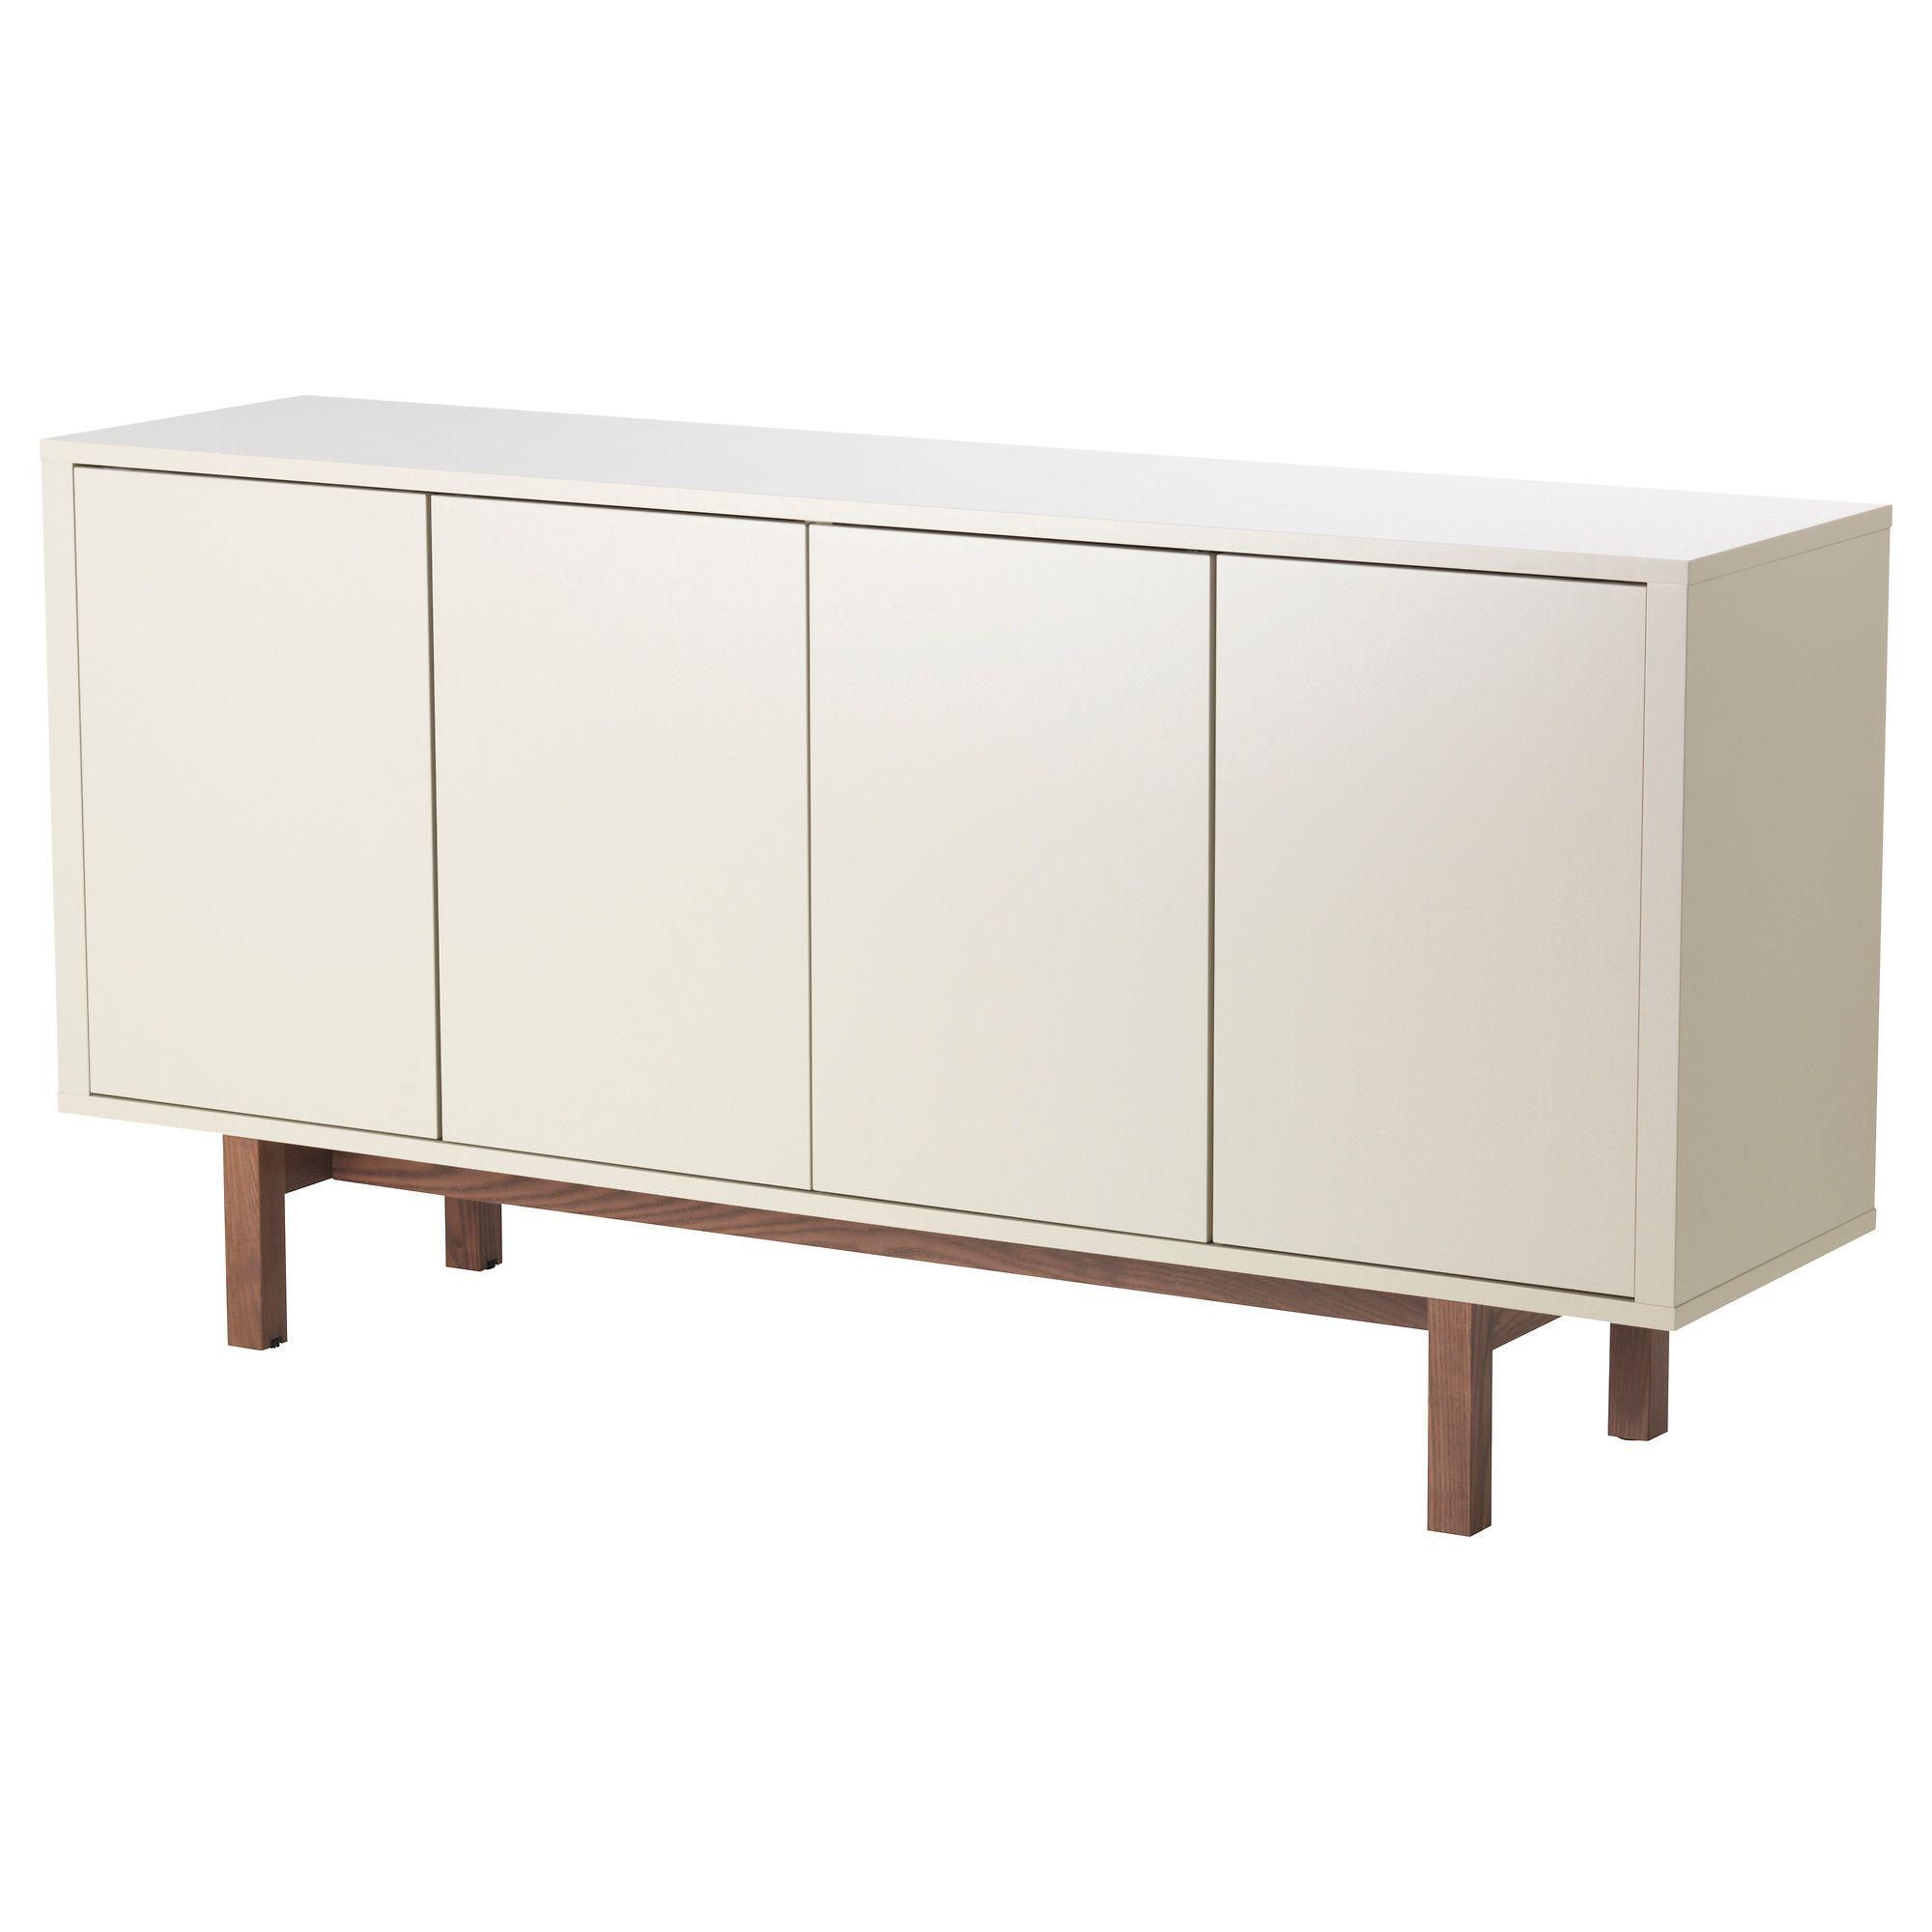 Us Furniture And Home Furnishings Ikea Stockholm Ikea